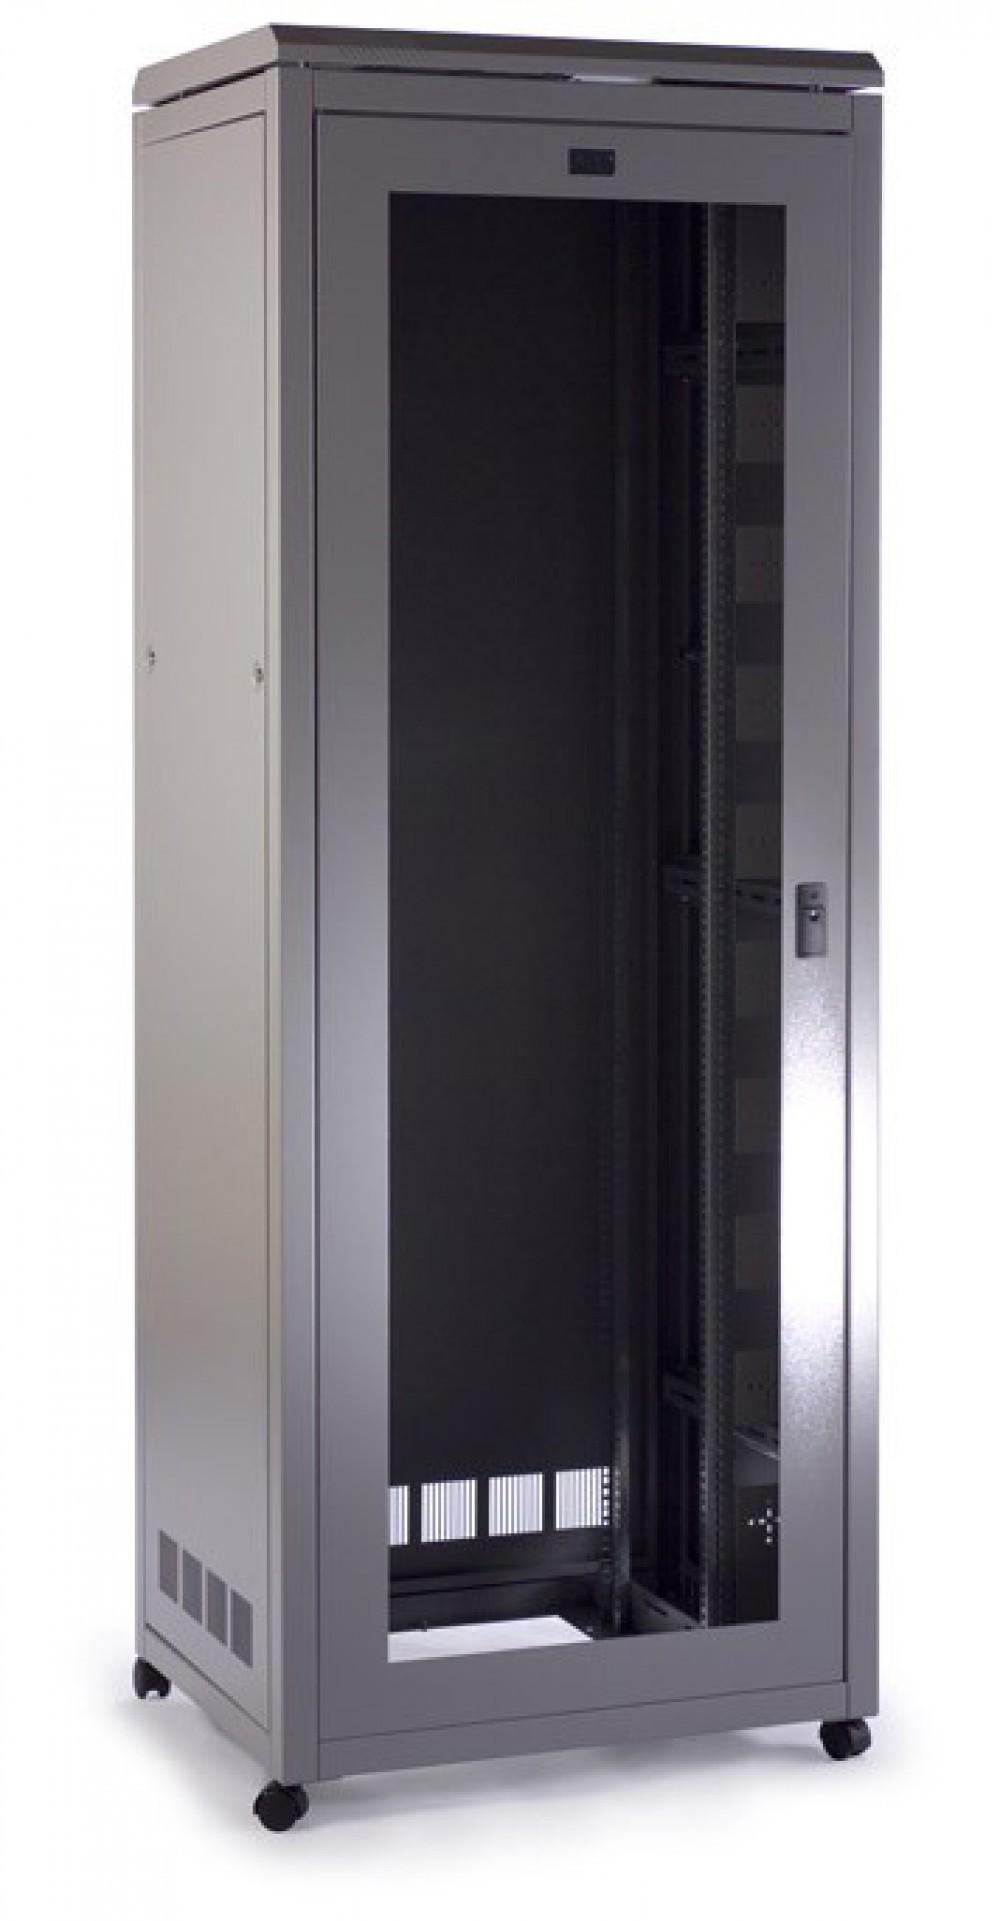 Prism Free Standing Cabinet 45U (2205x800x800)